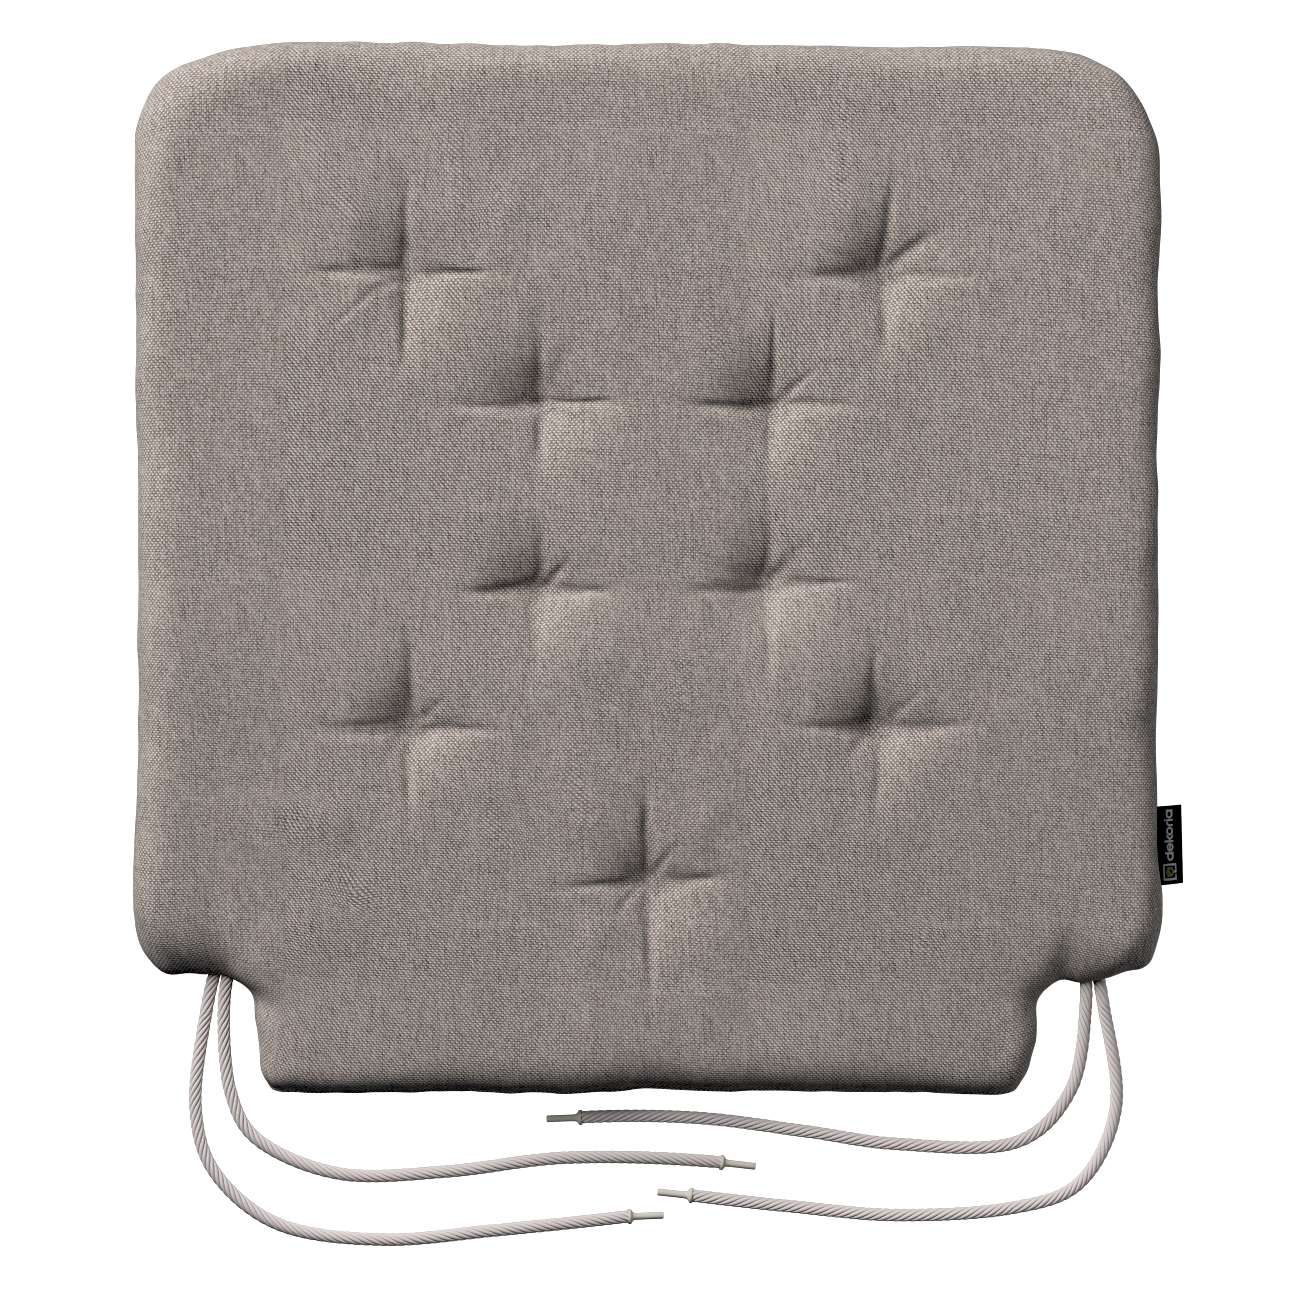 Kėdės pagalvėlė Olek  kolekcijoje Etna , audinys: 705-09